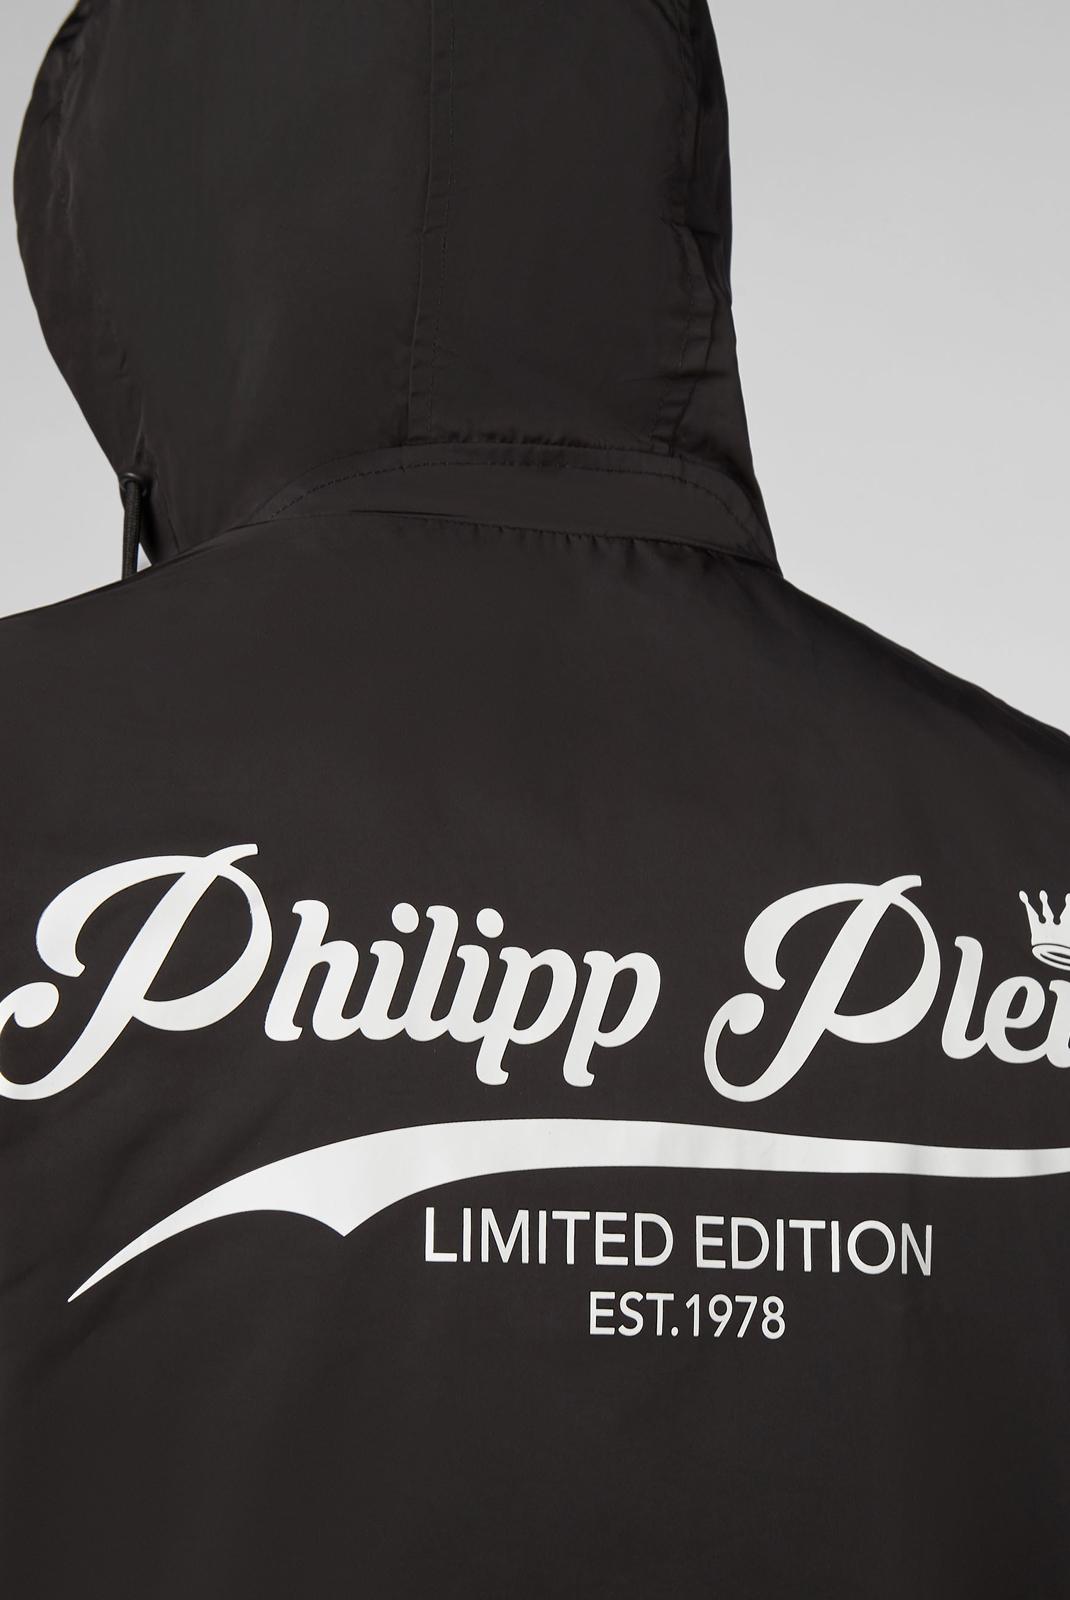 Blousons / doudounes  Philipp plein MRB1554 02 BLACK